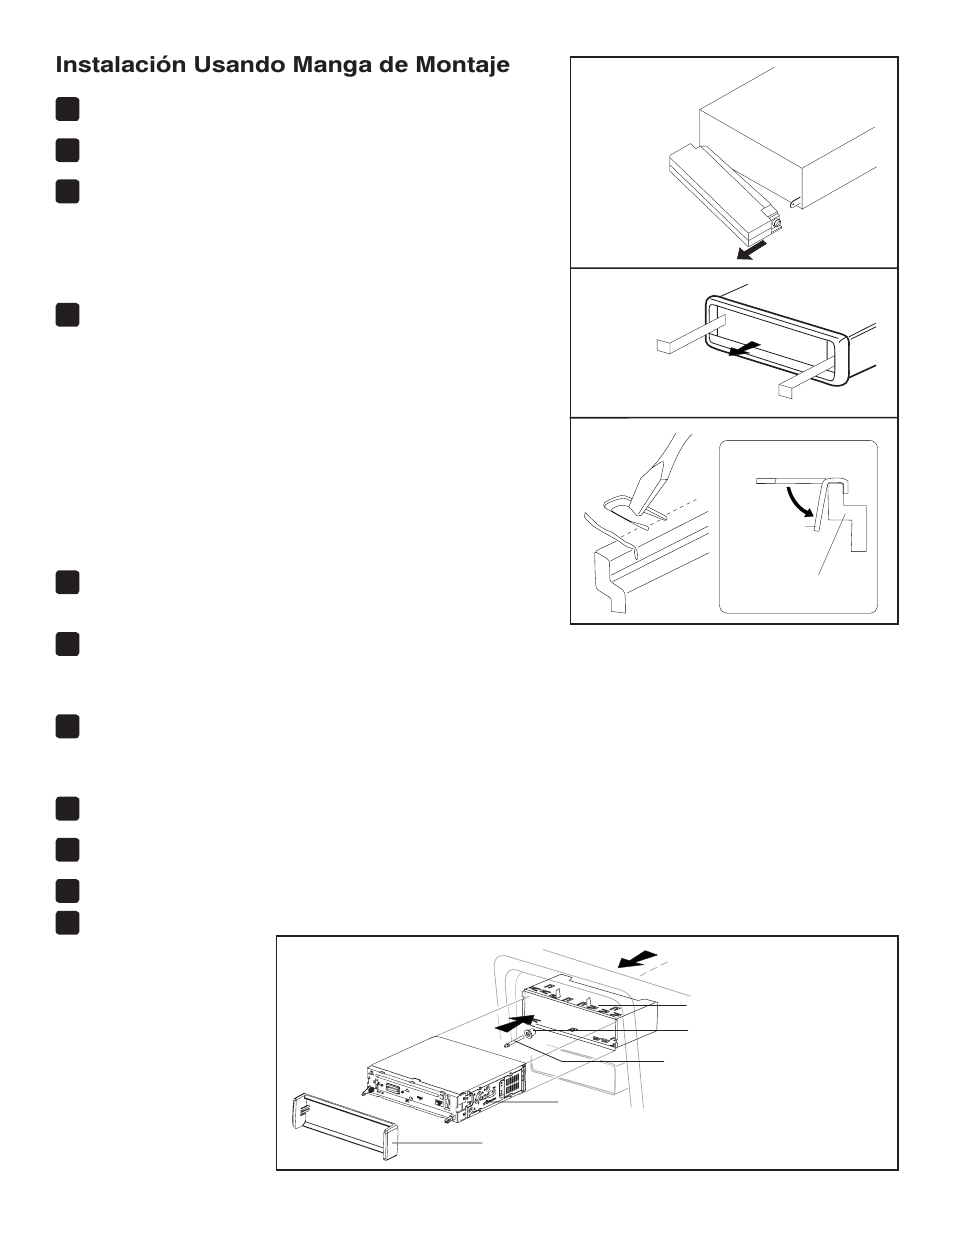 instalaci n usando manga de montaje jensen vm8113 user manual rh manualsdir com User Training Online User Guide